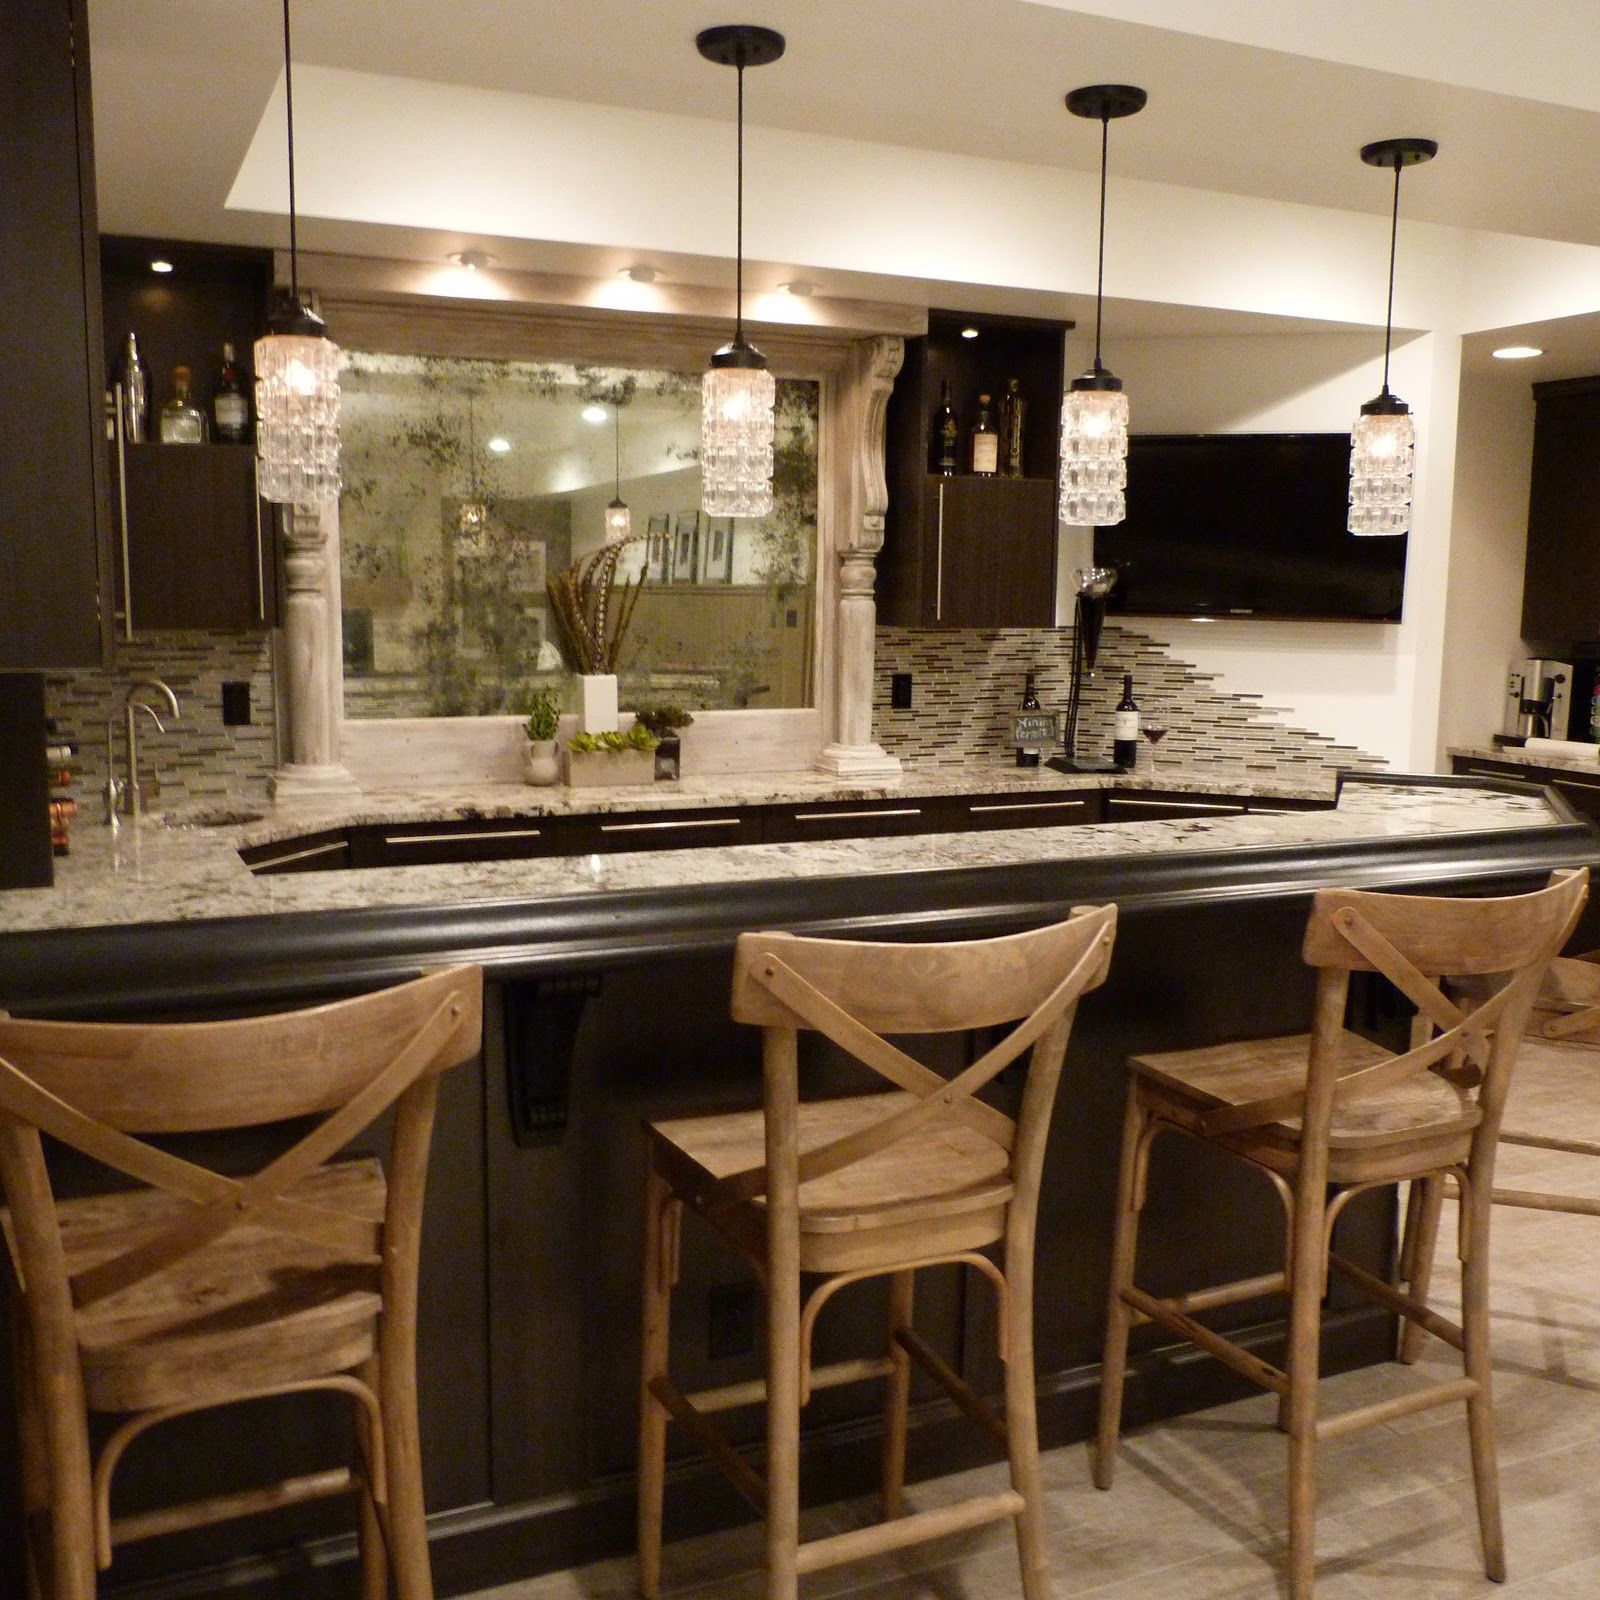 Basement Interior Design: Basement Remodeling Ideas & Inspiration